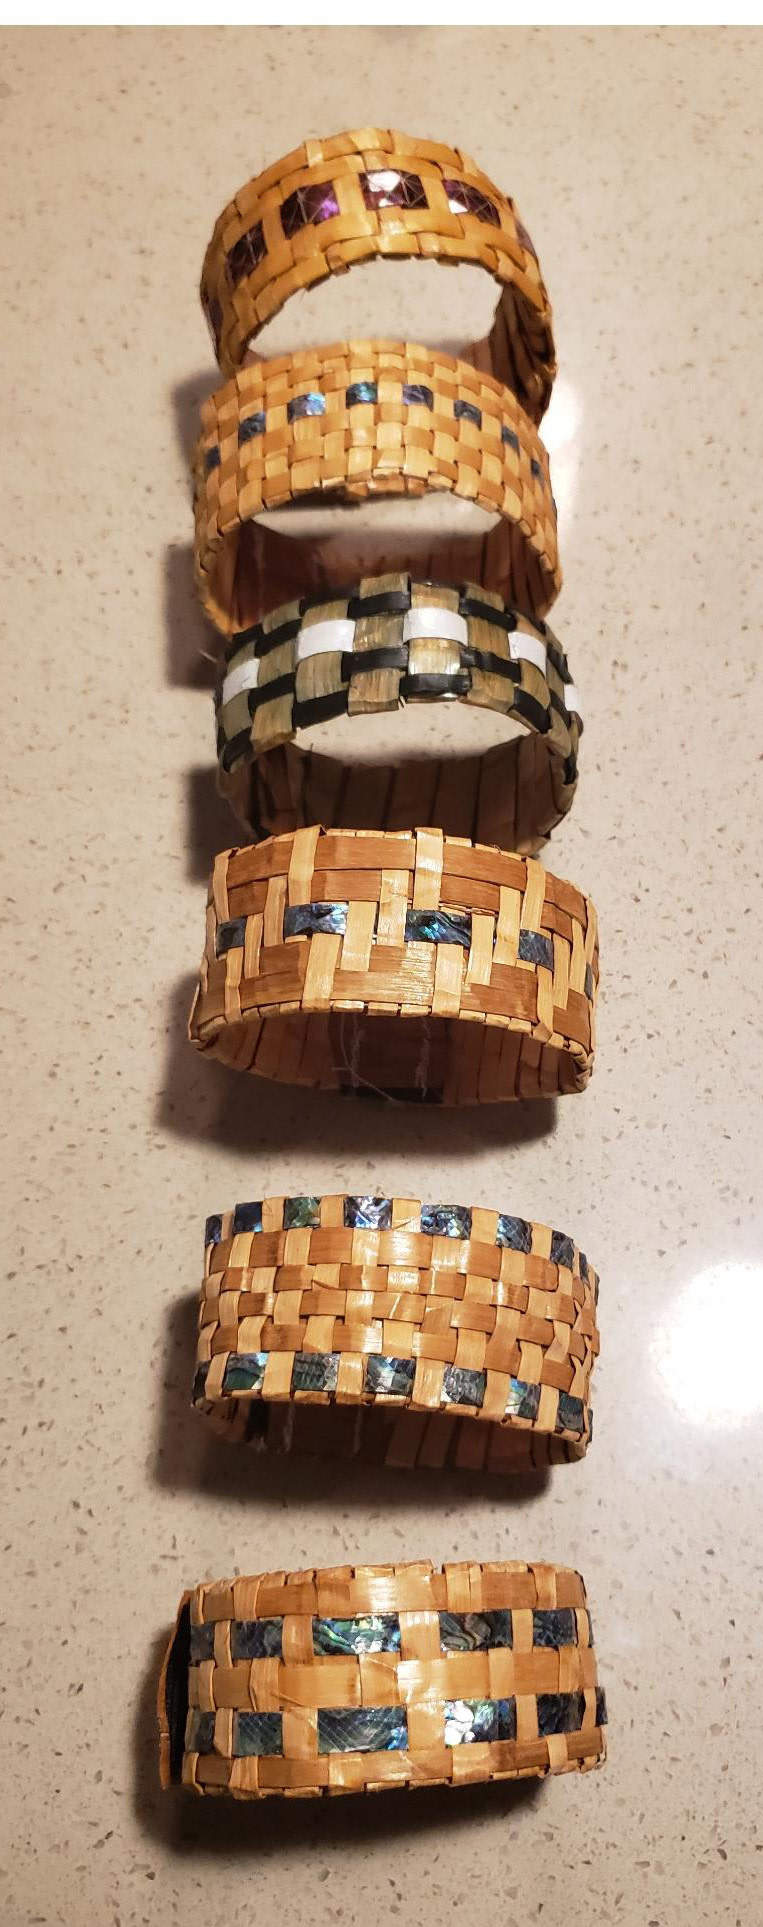 Cedar Bracelet with Abalone inlay- by C. Chapman-1